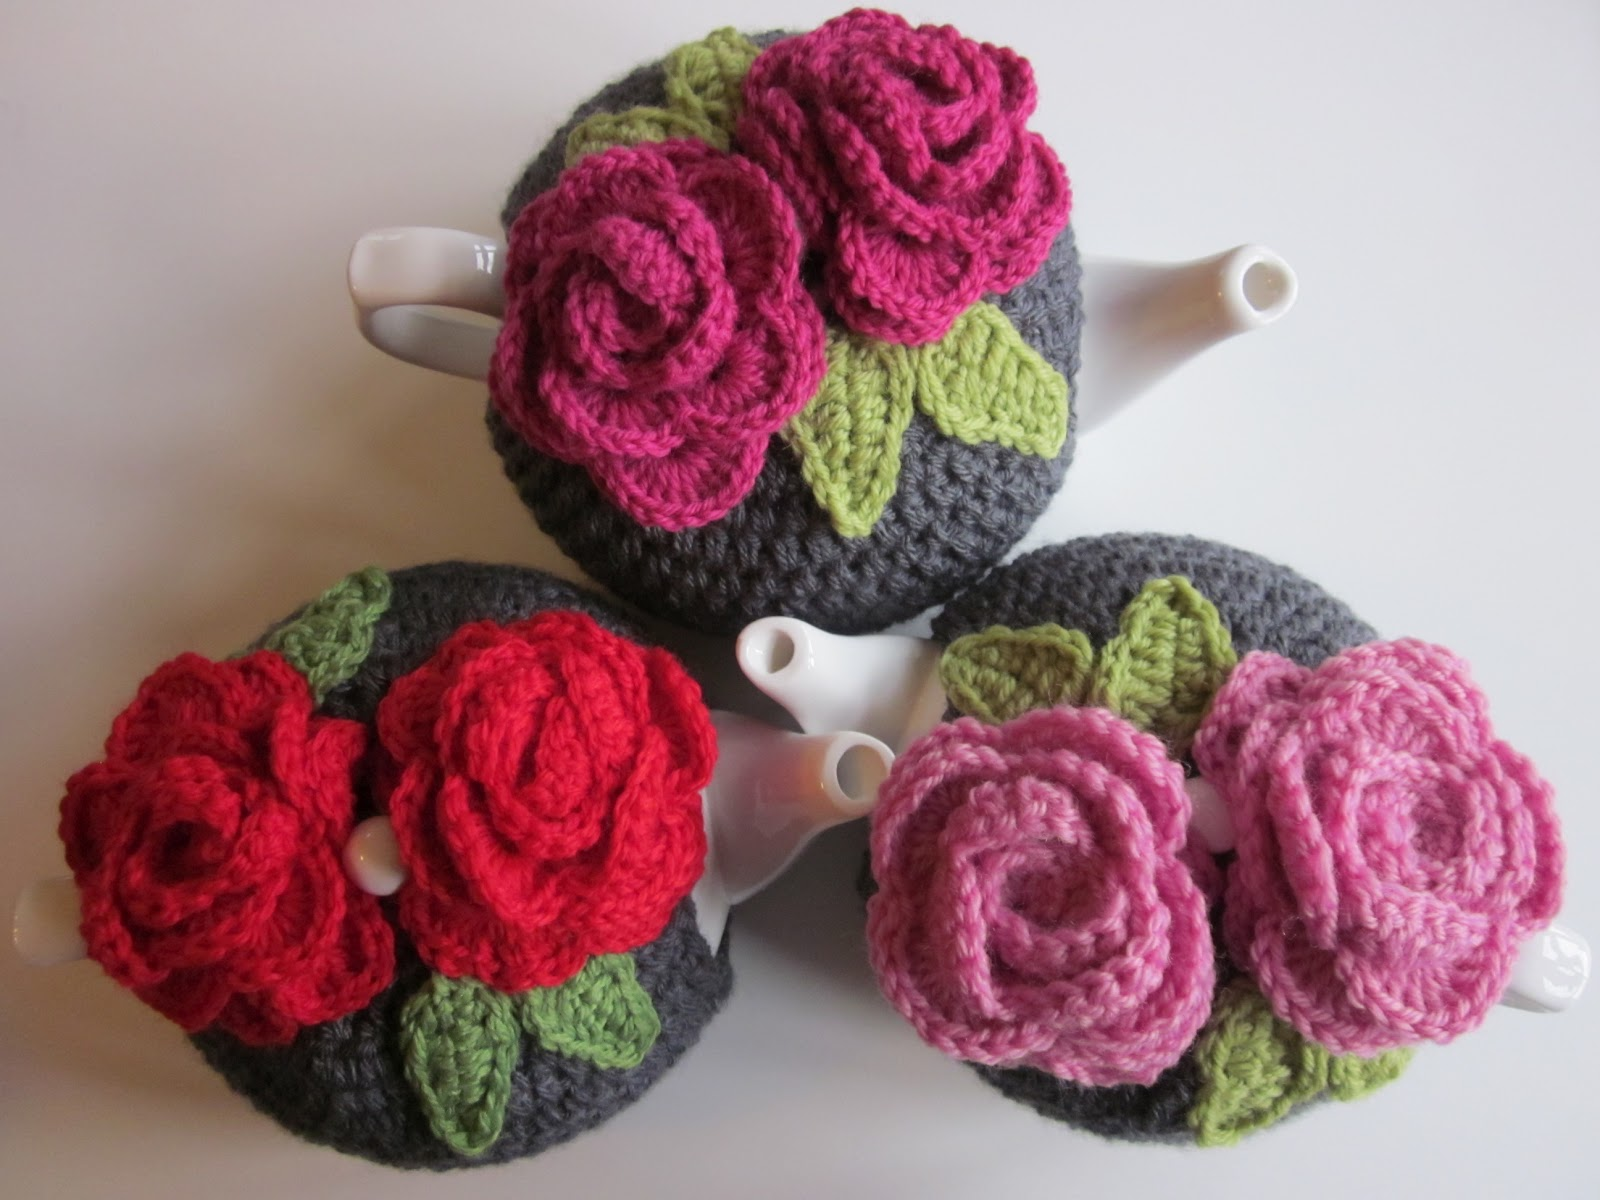 Pretty roses tea cozy